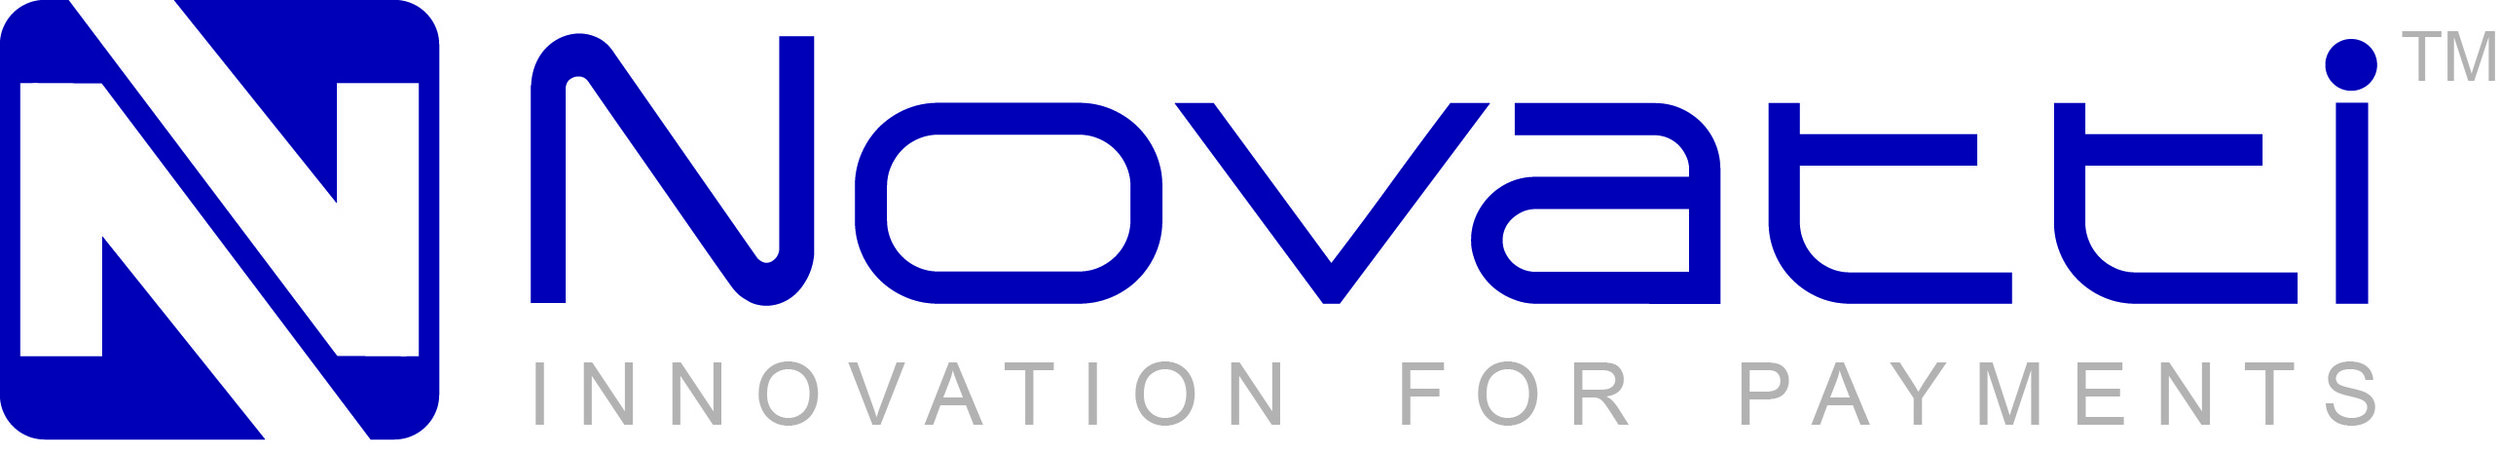 Logo color 2 Ai.jpg